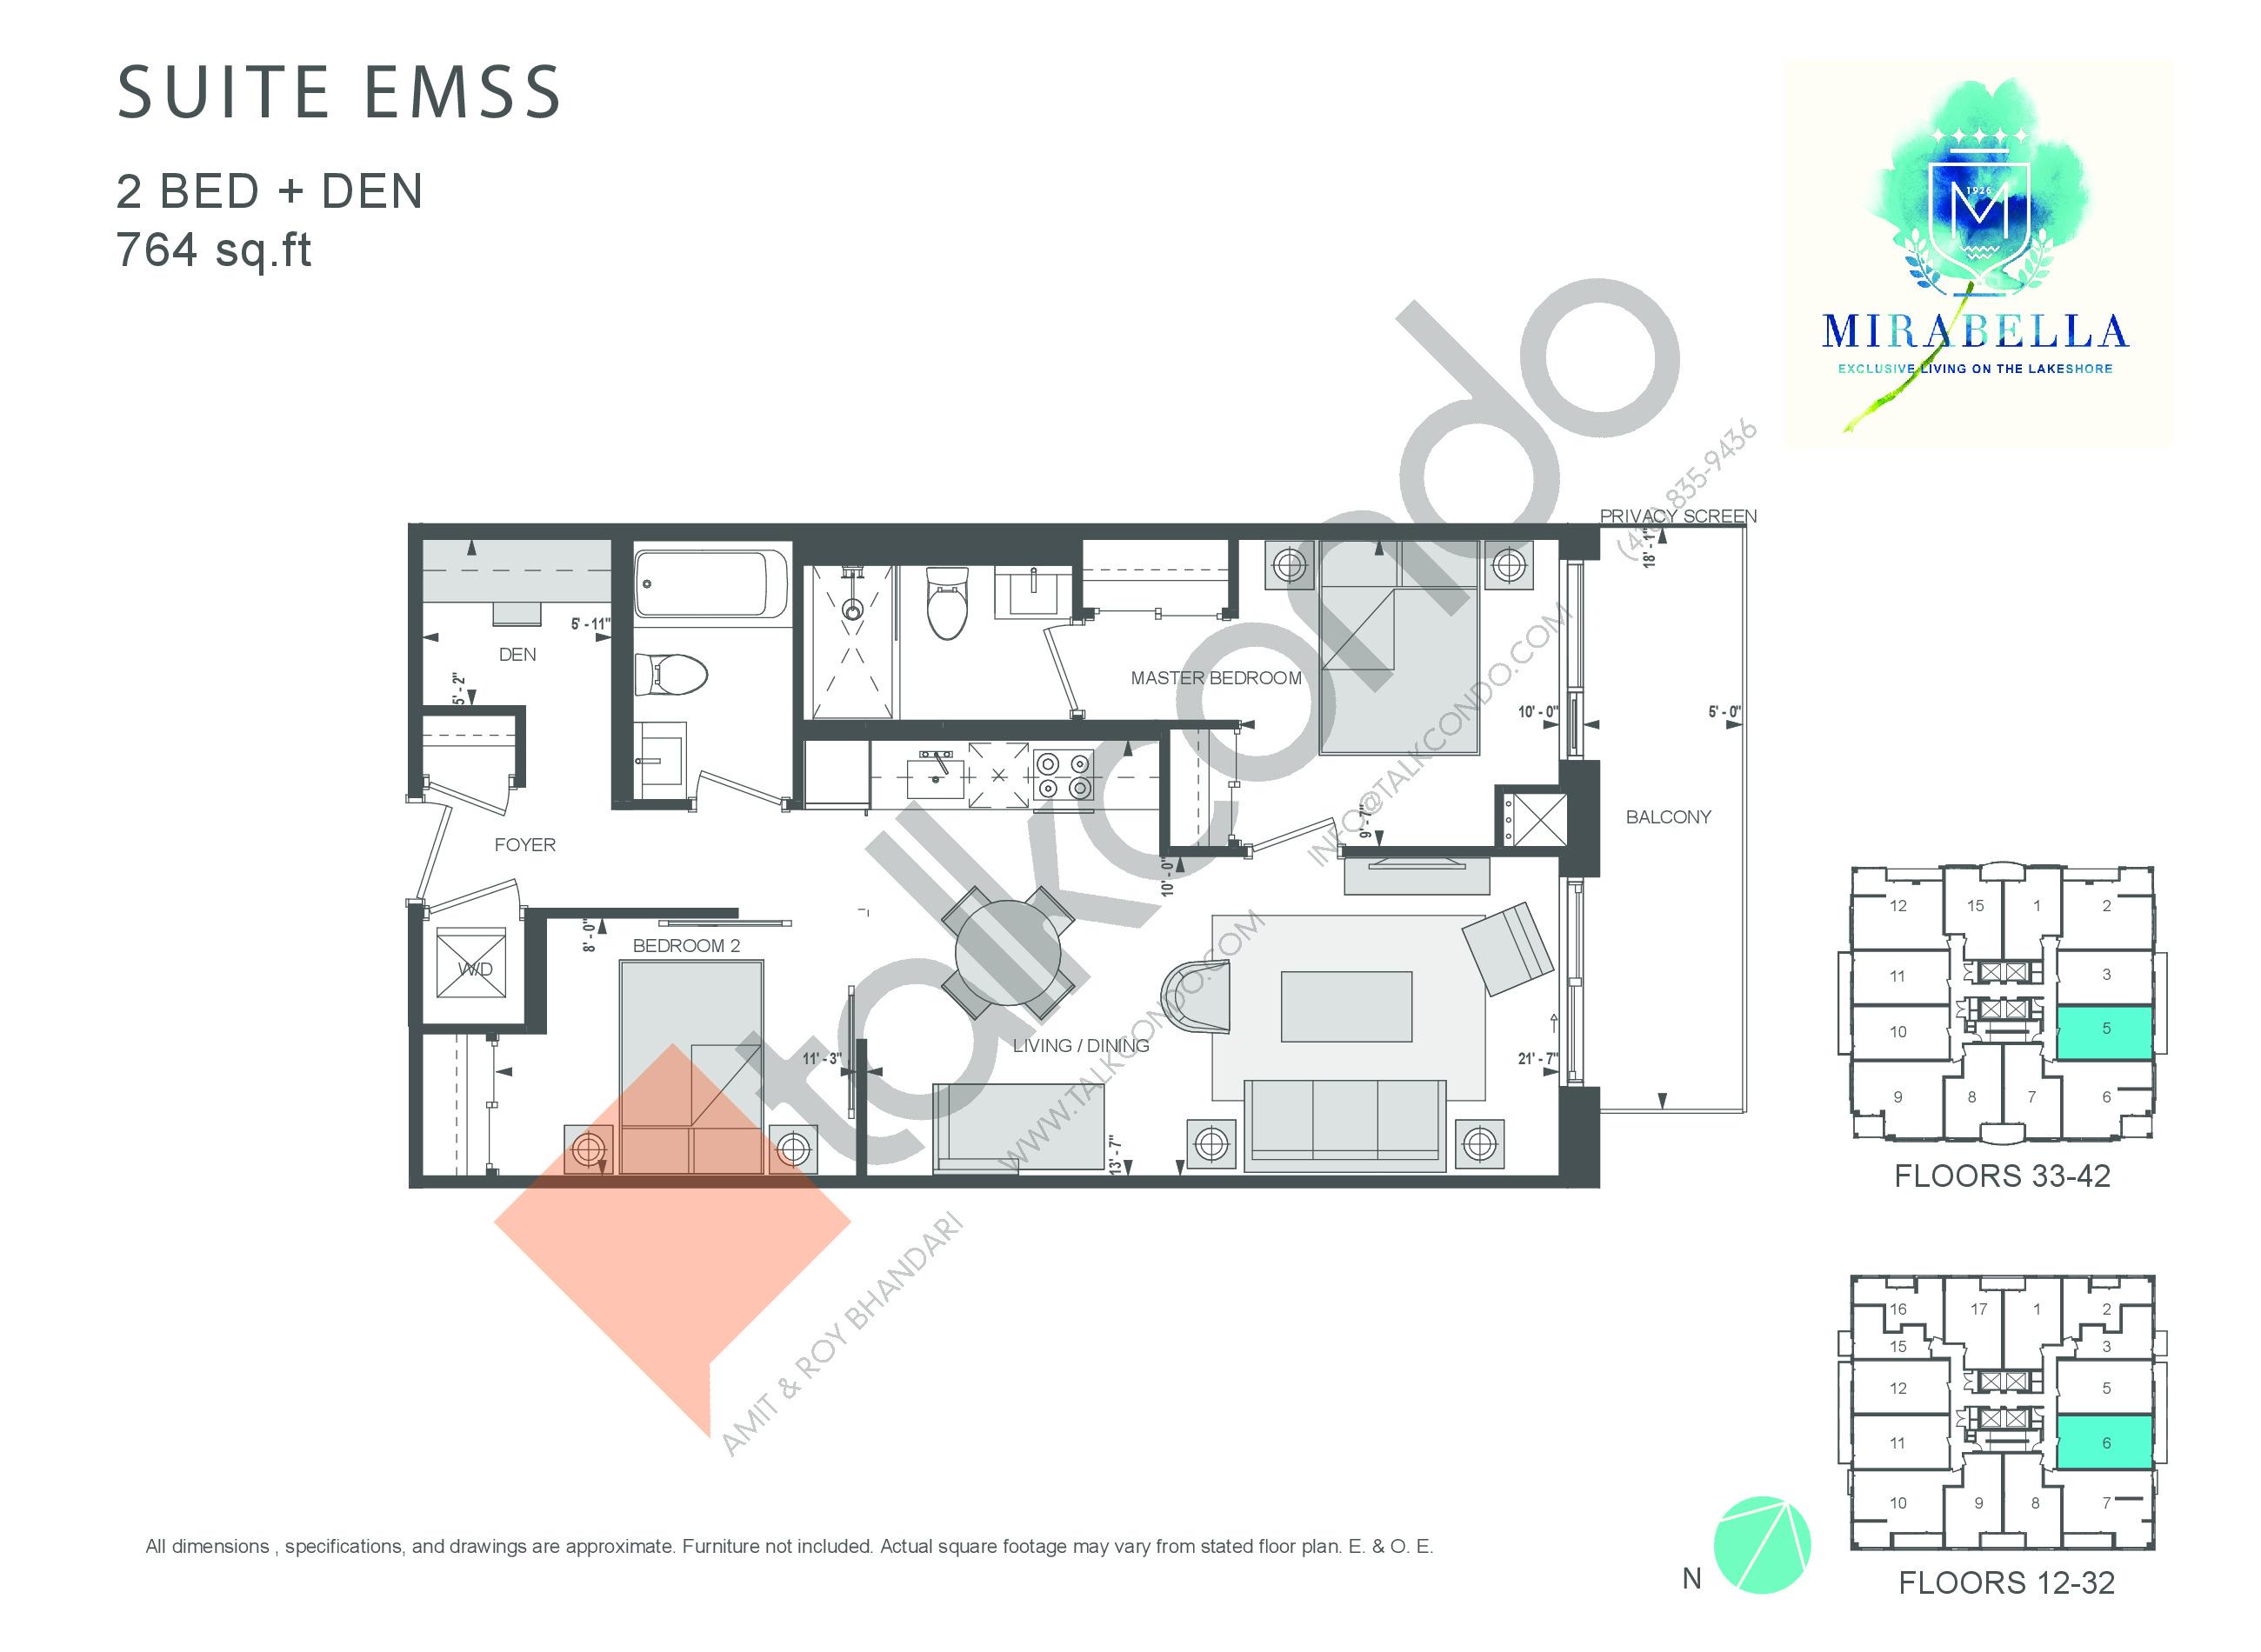 Suite EMSS Floor Plan at Mirabella Luxury Condos East Tower - 764 sq.ft